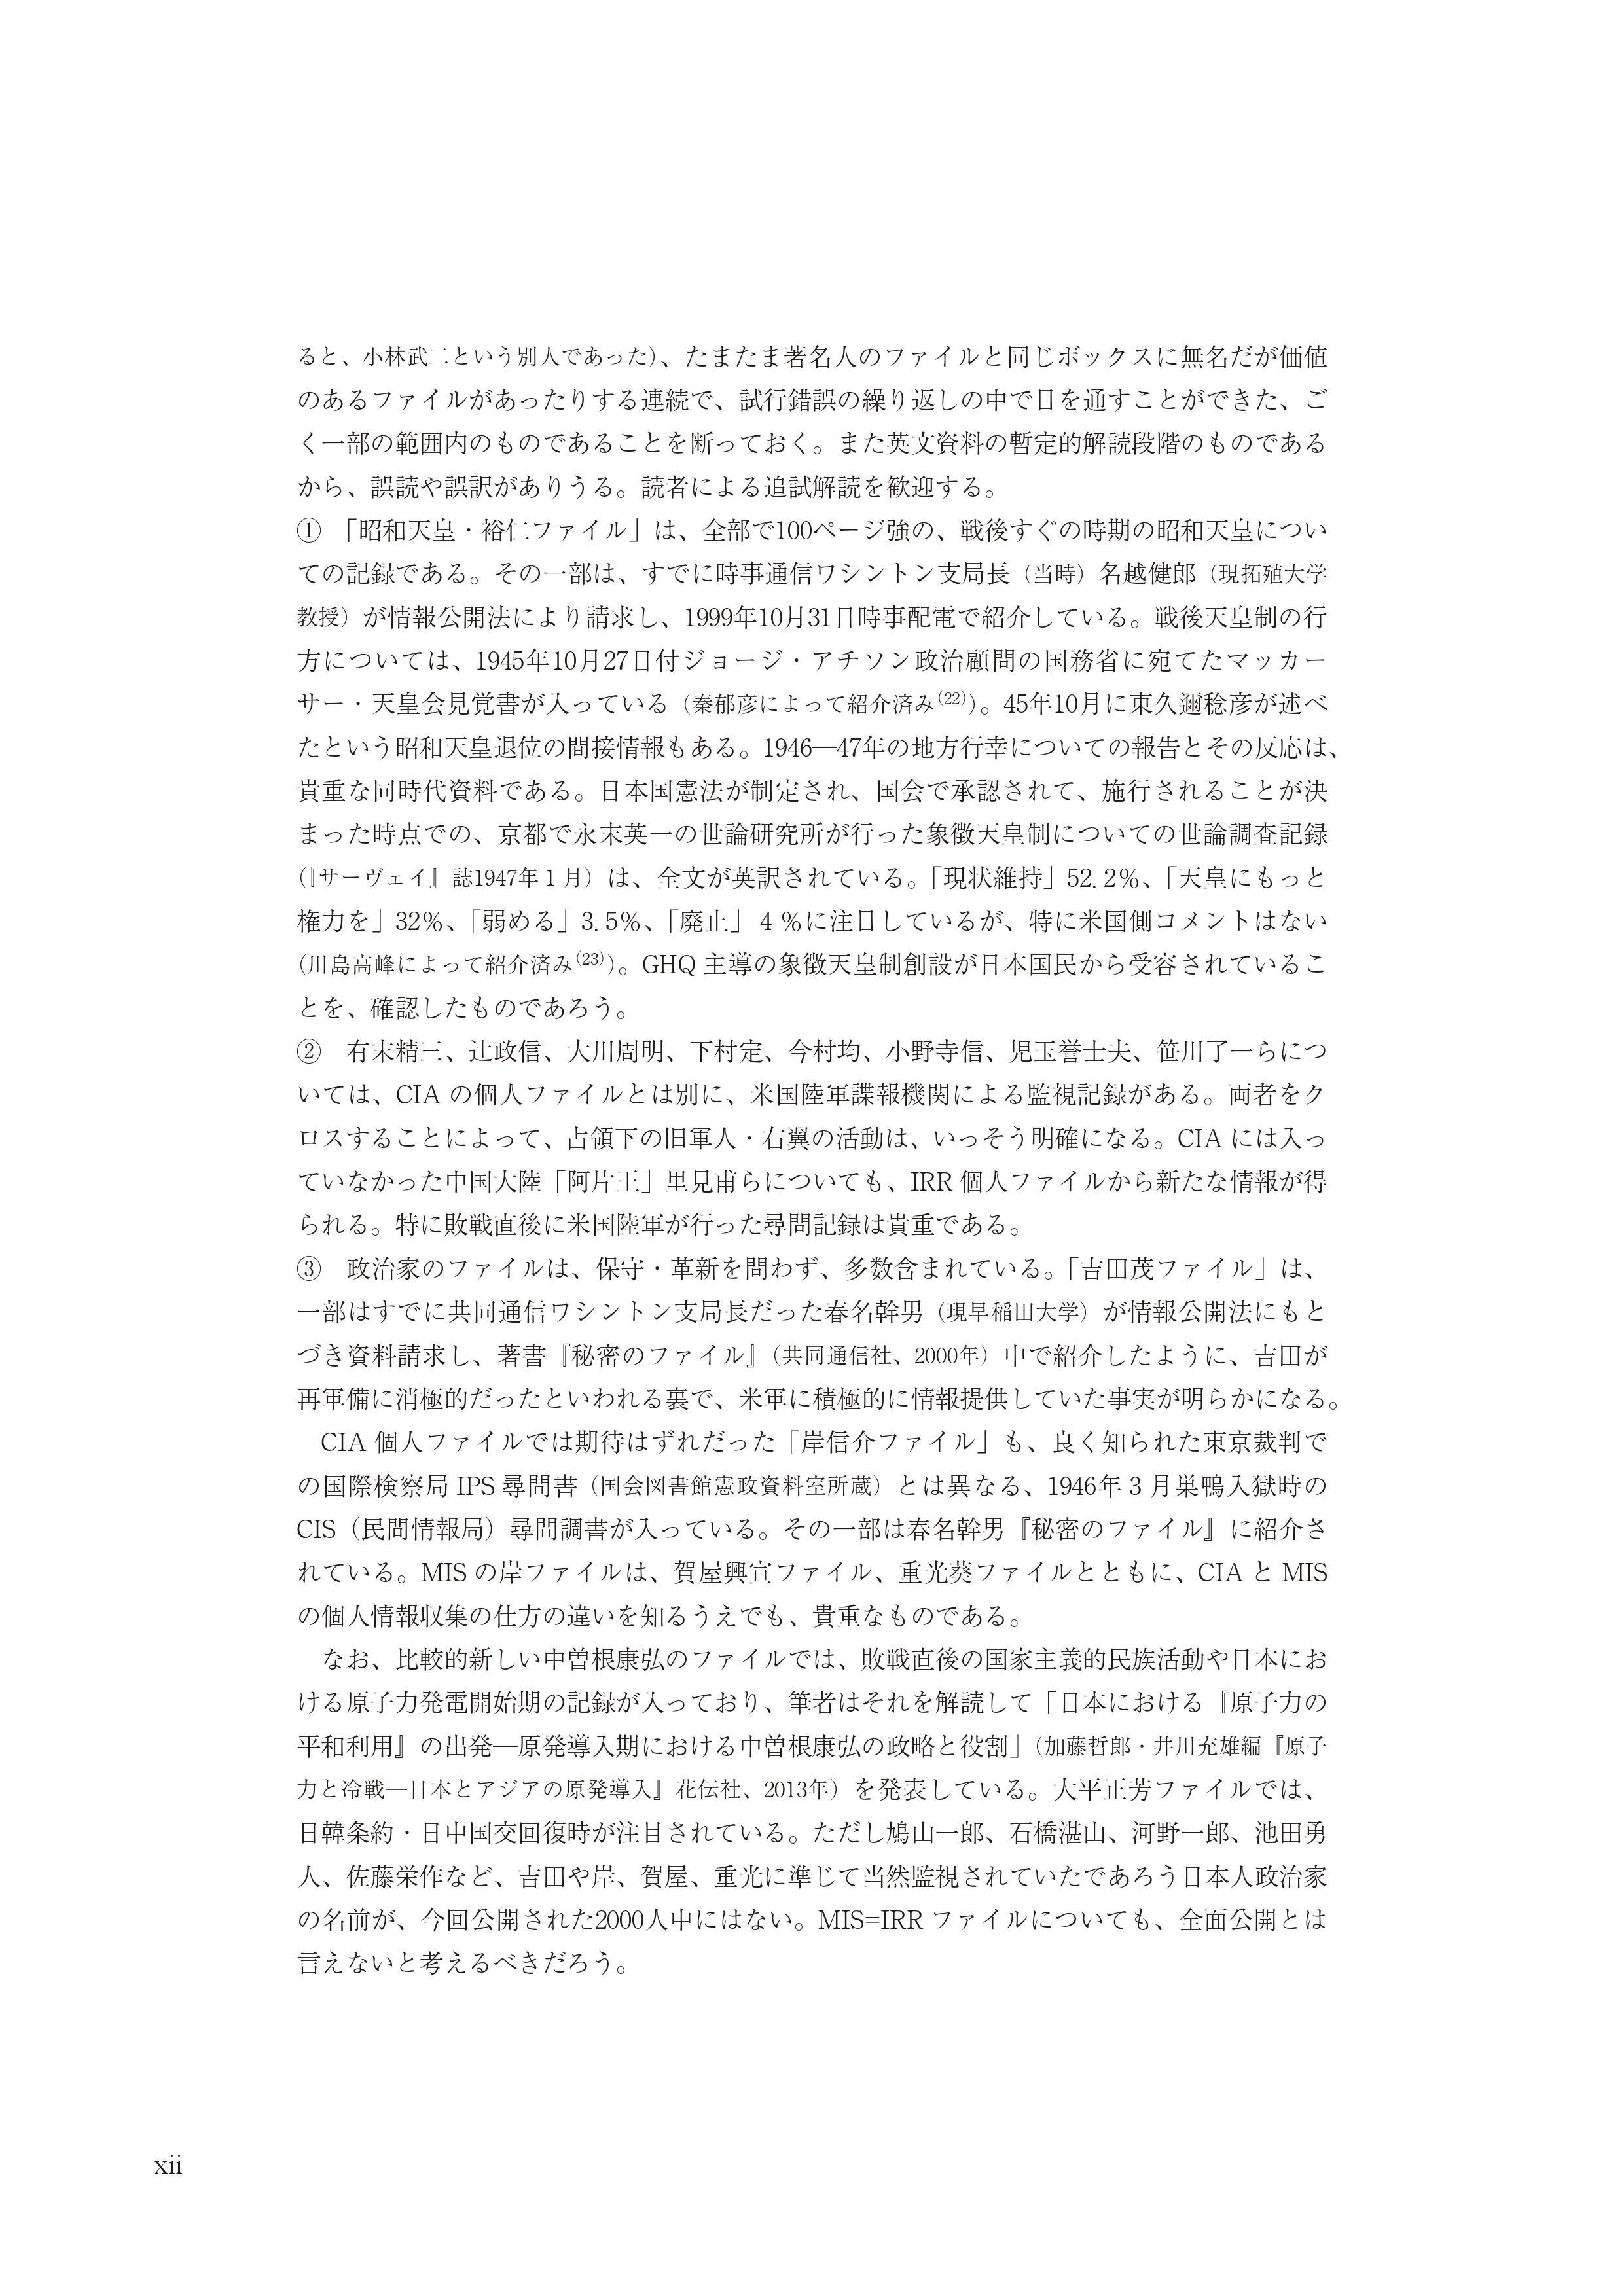 CIA日本人ファイル0001 (12)